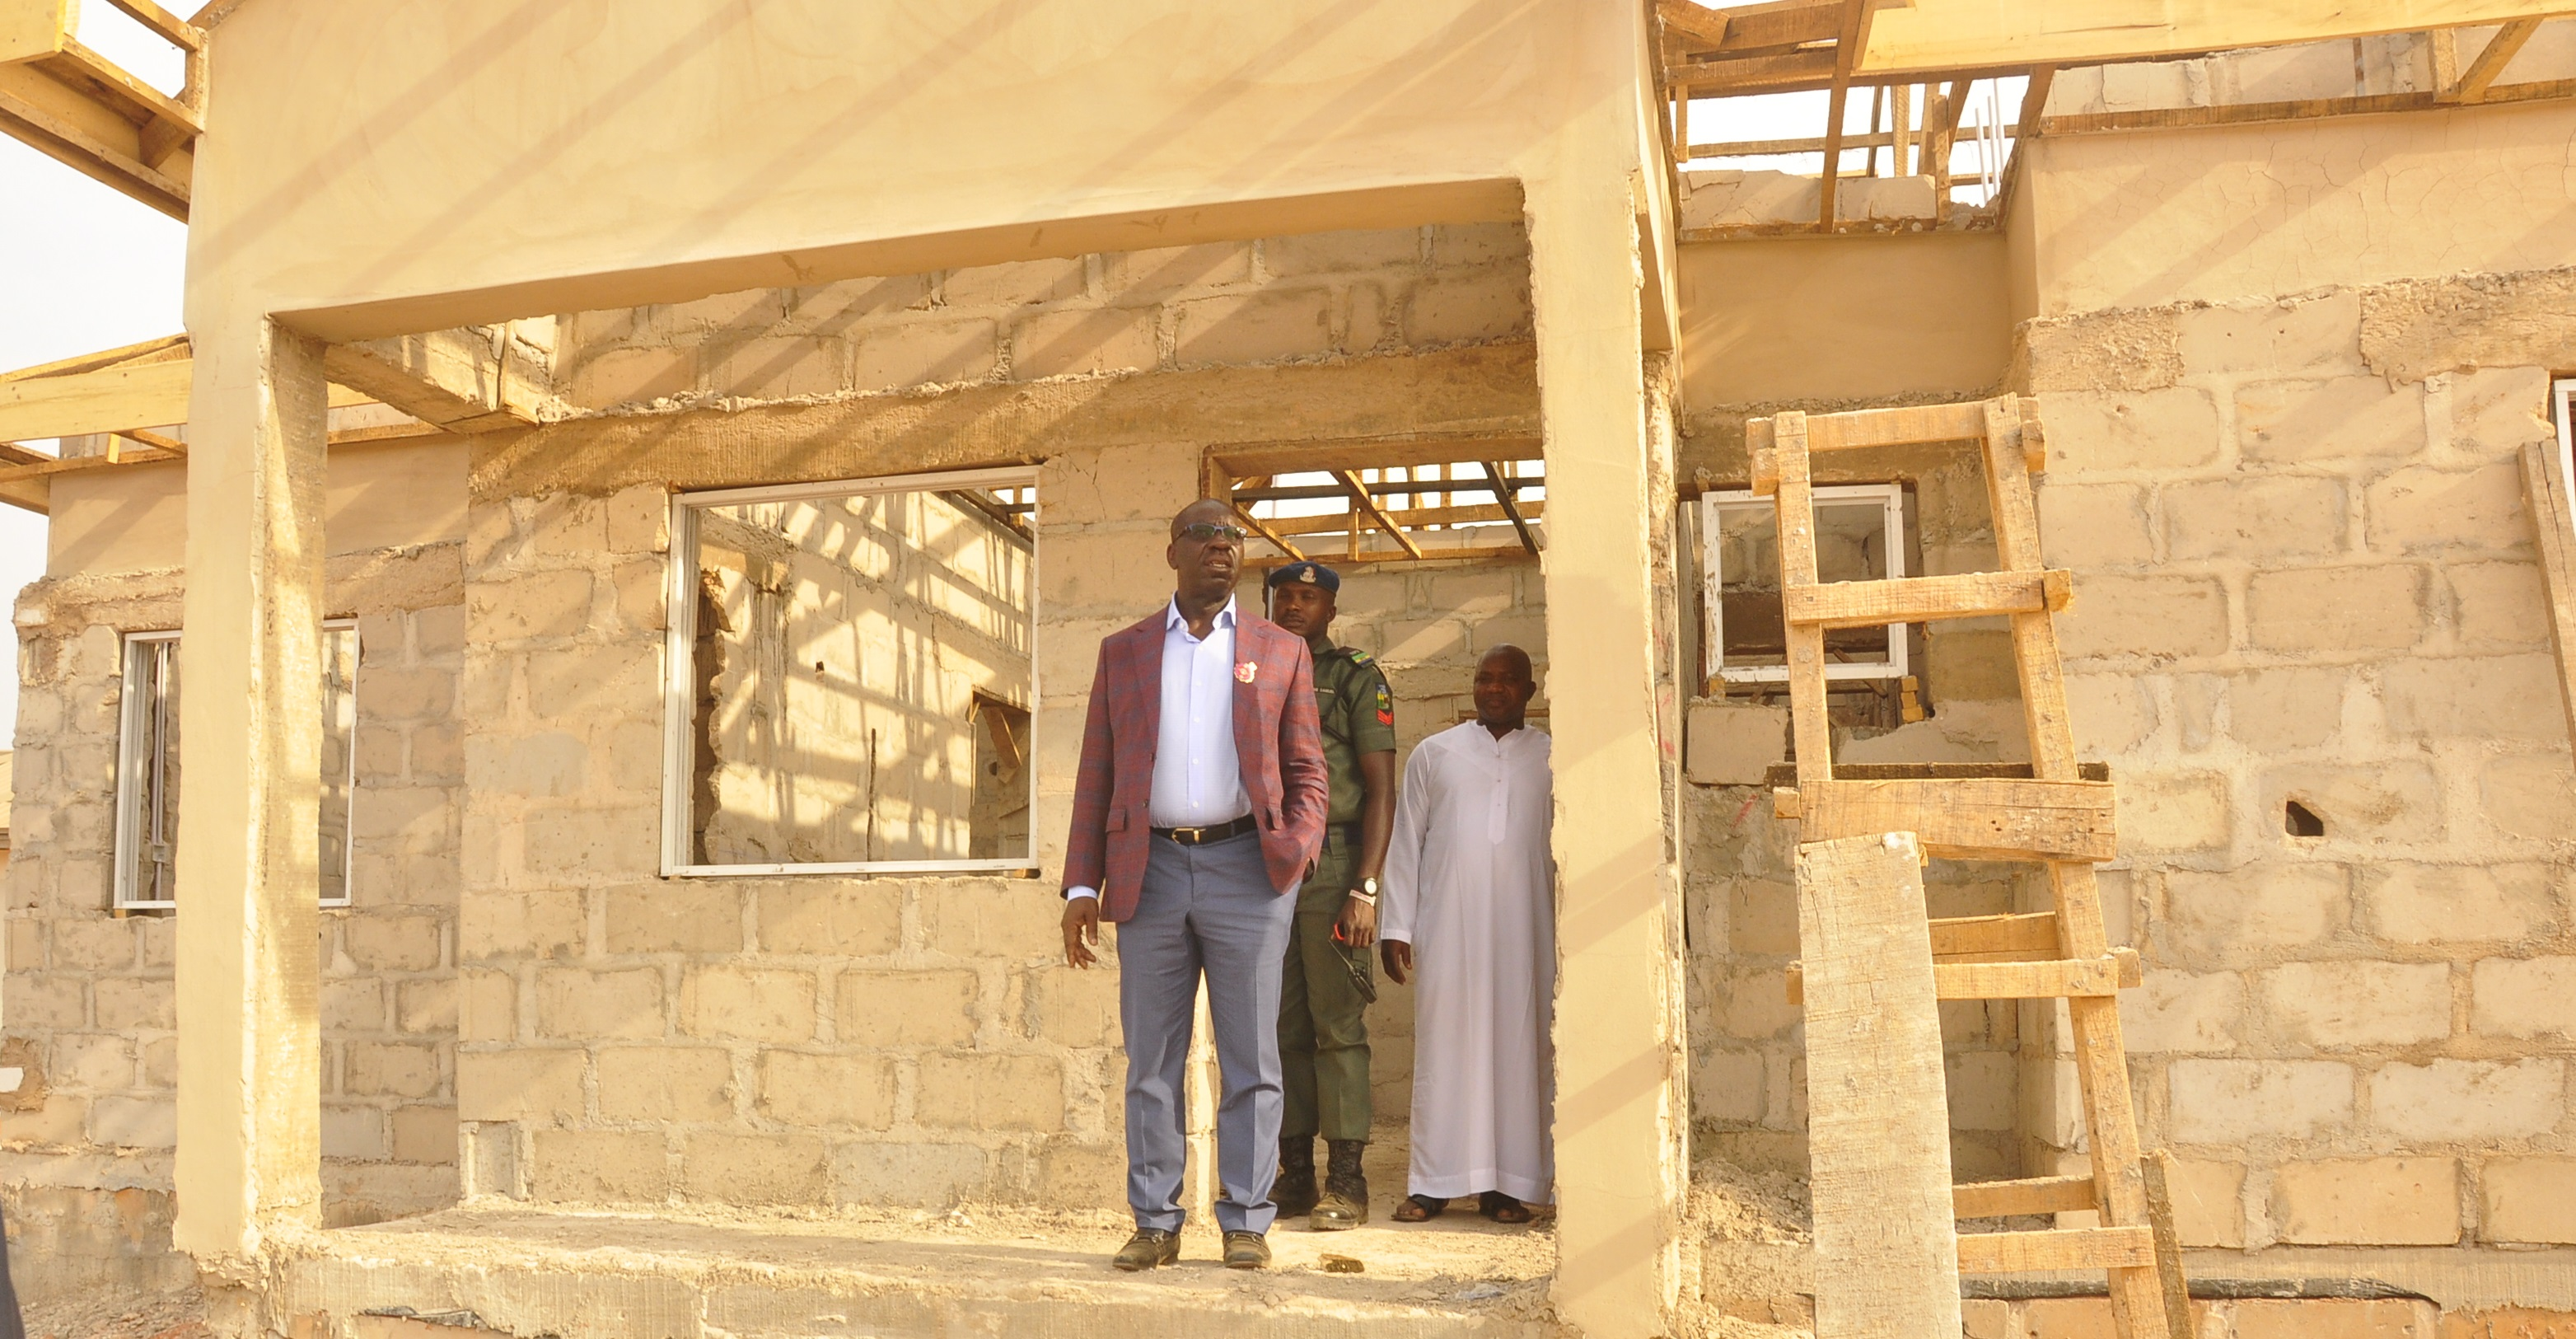 Emotan Gardens: Obaseki inspects progress of work on estate, says project on course